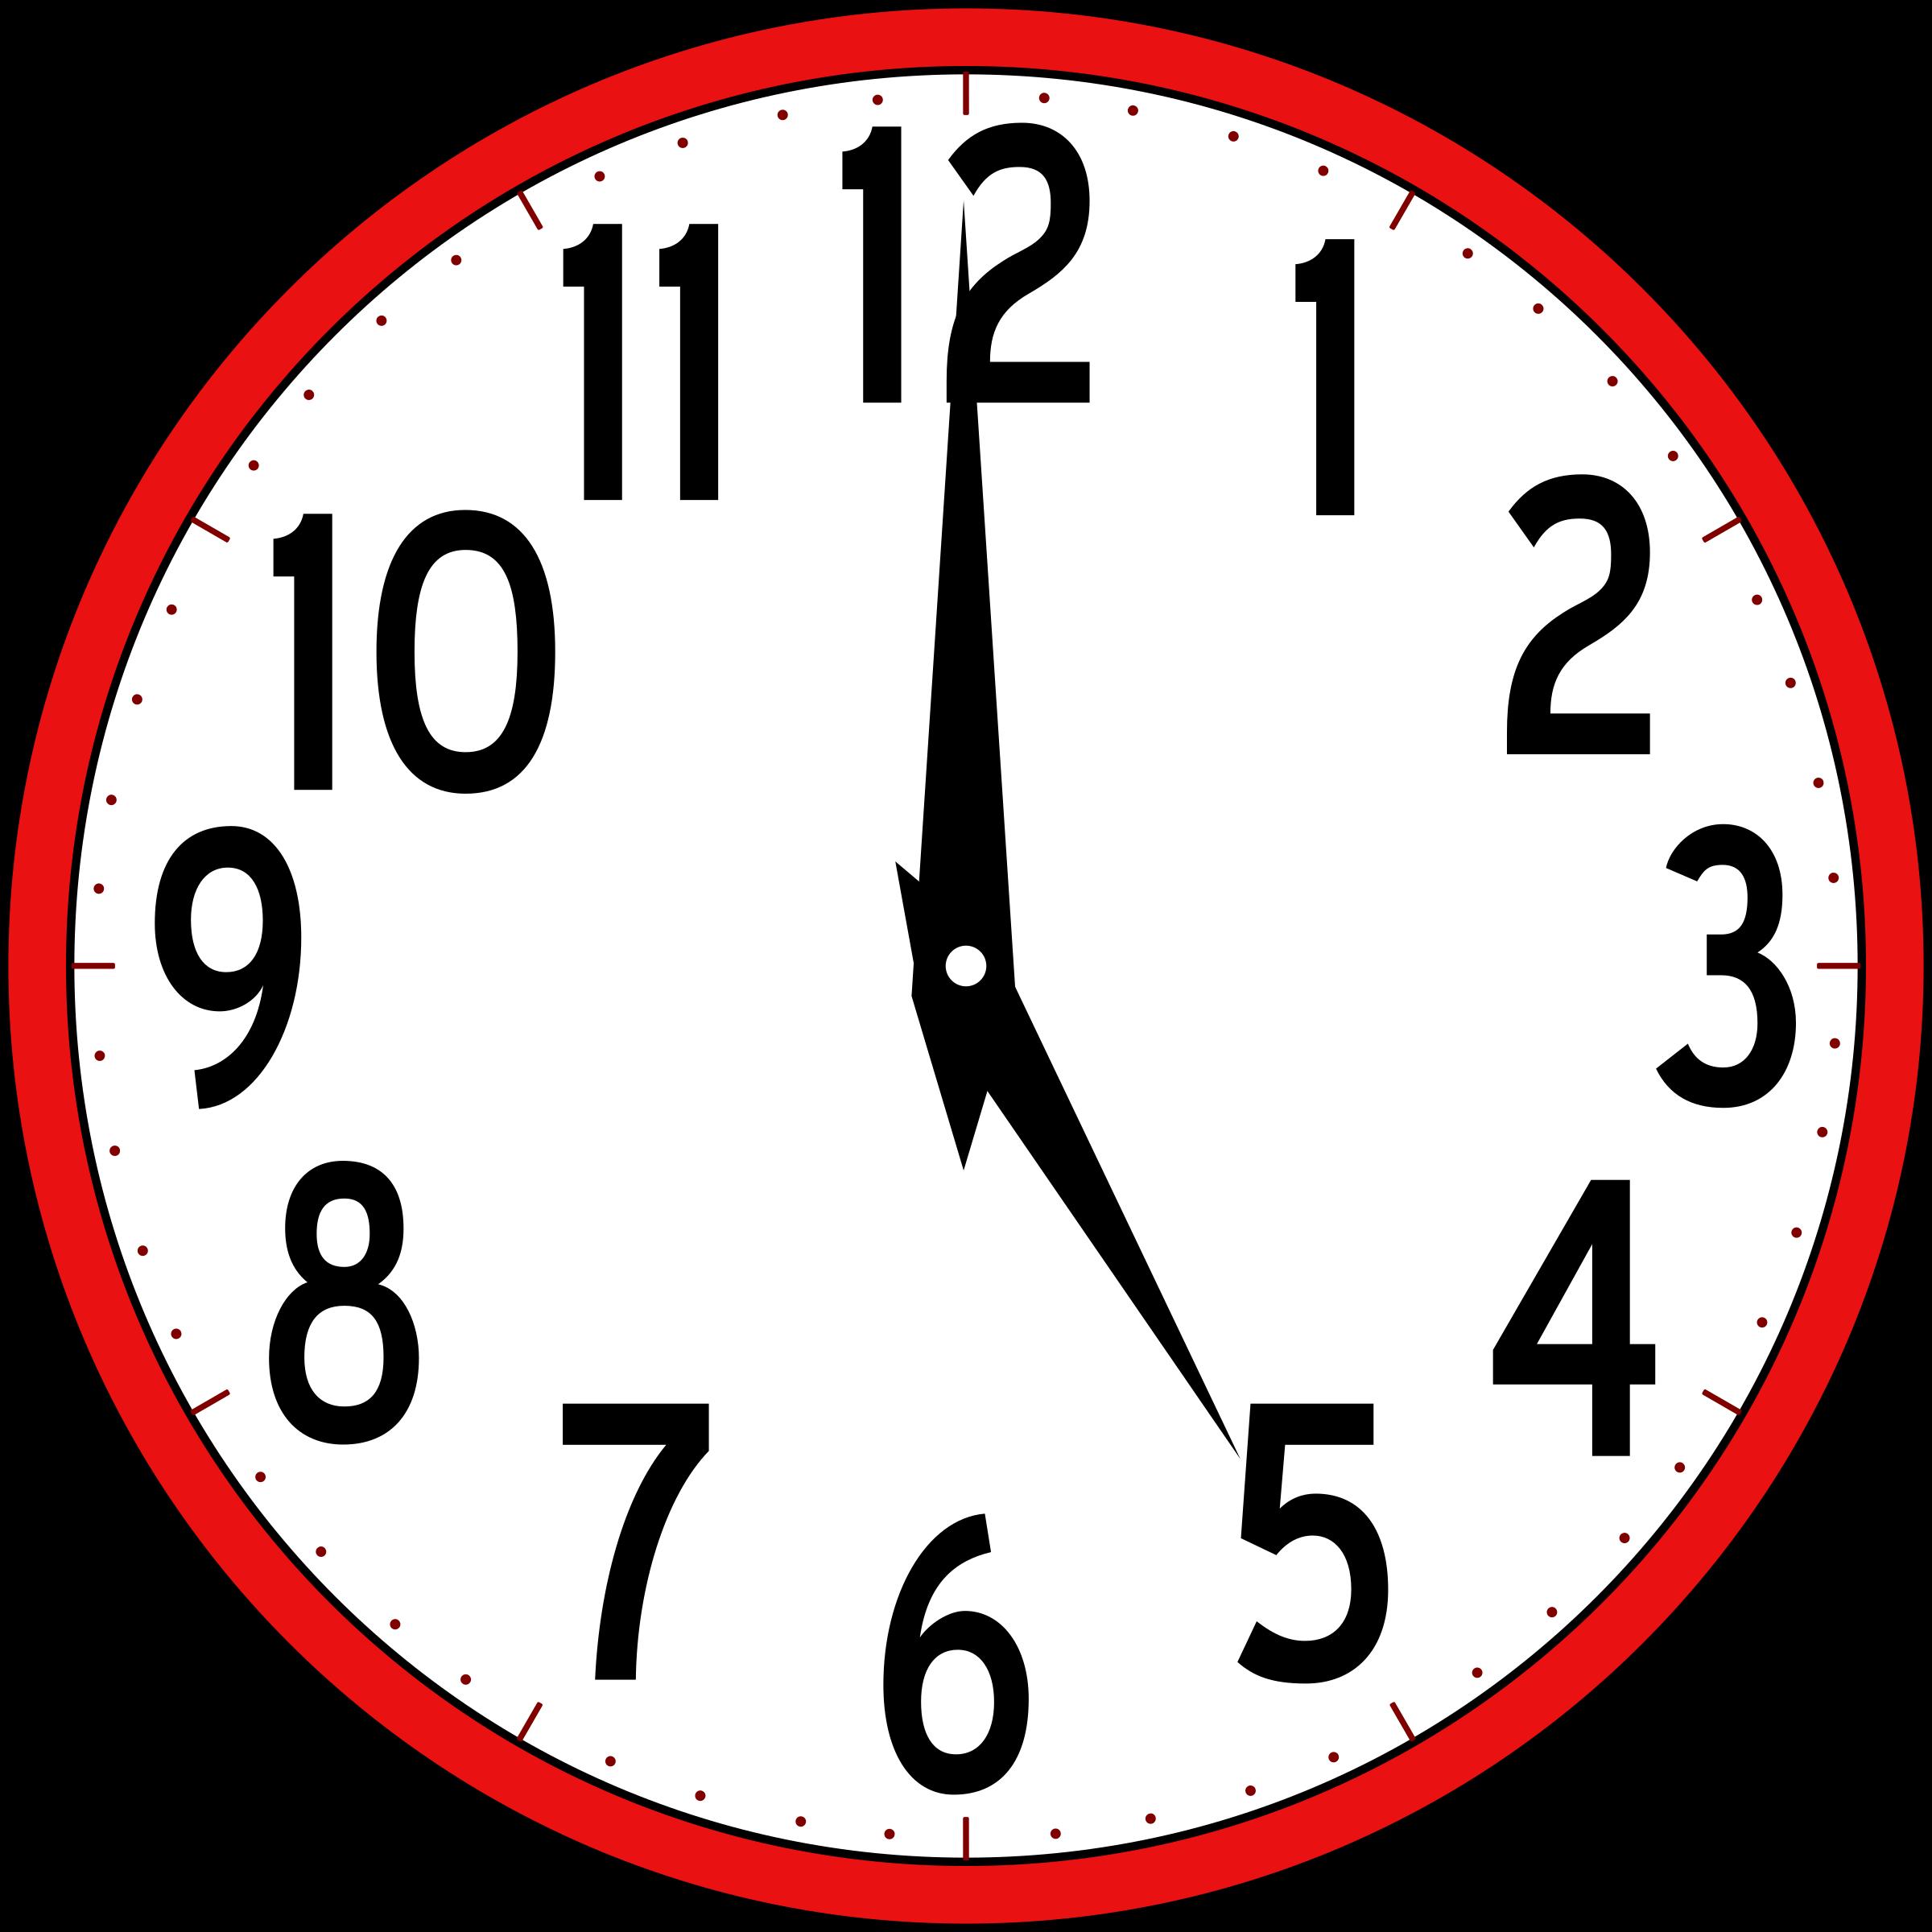 2400x2400 Clock Glamorous Clock Clipart Ideas Analog Clock Clipart, Clock